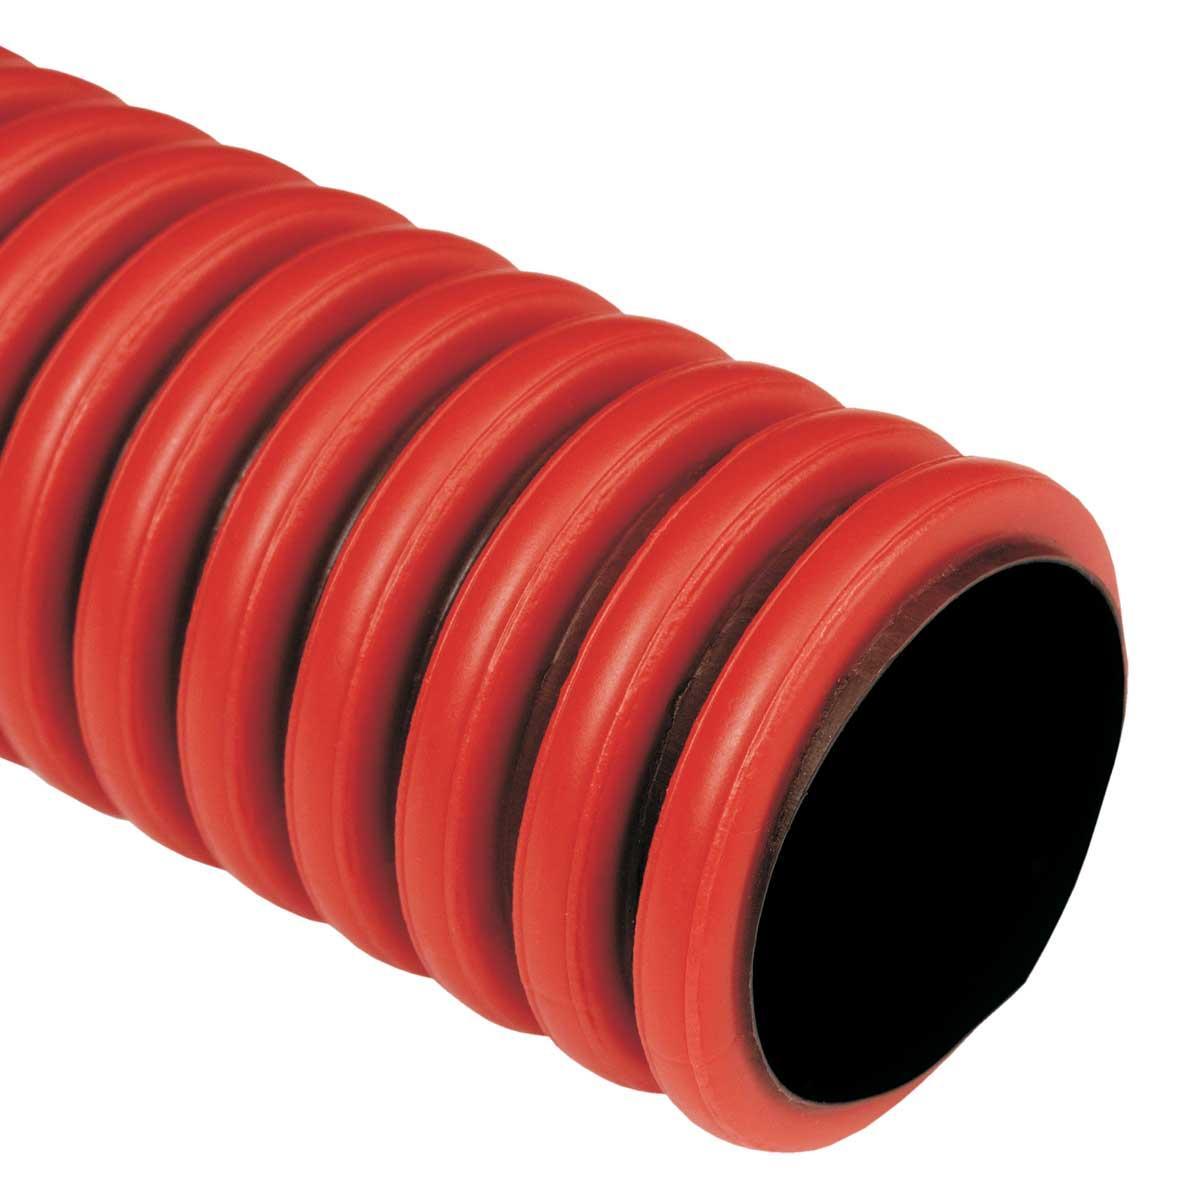 Труба гофрована гнучка двошарова Копофлекс, червона, протяжка, ; Ø63мм; поліетилен HDPE; Бухта 50 м